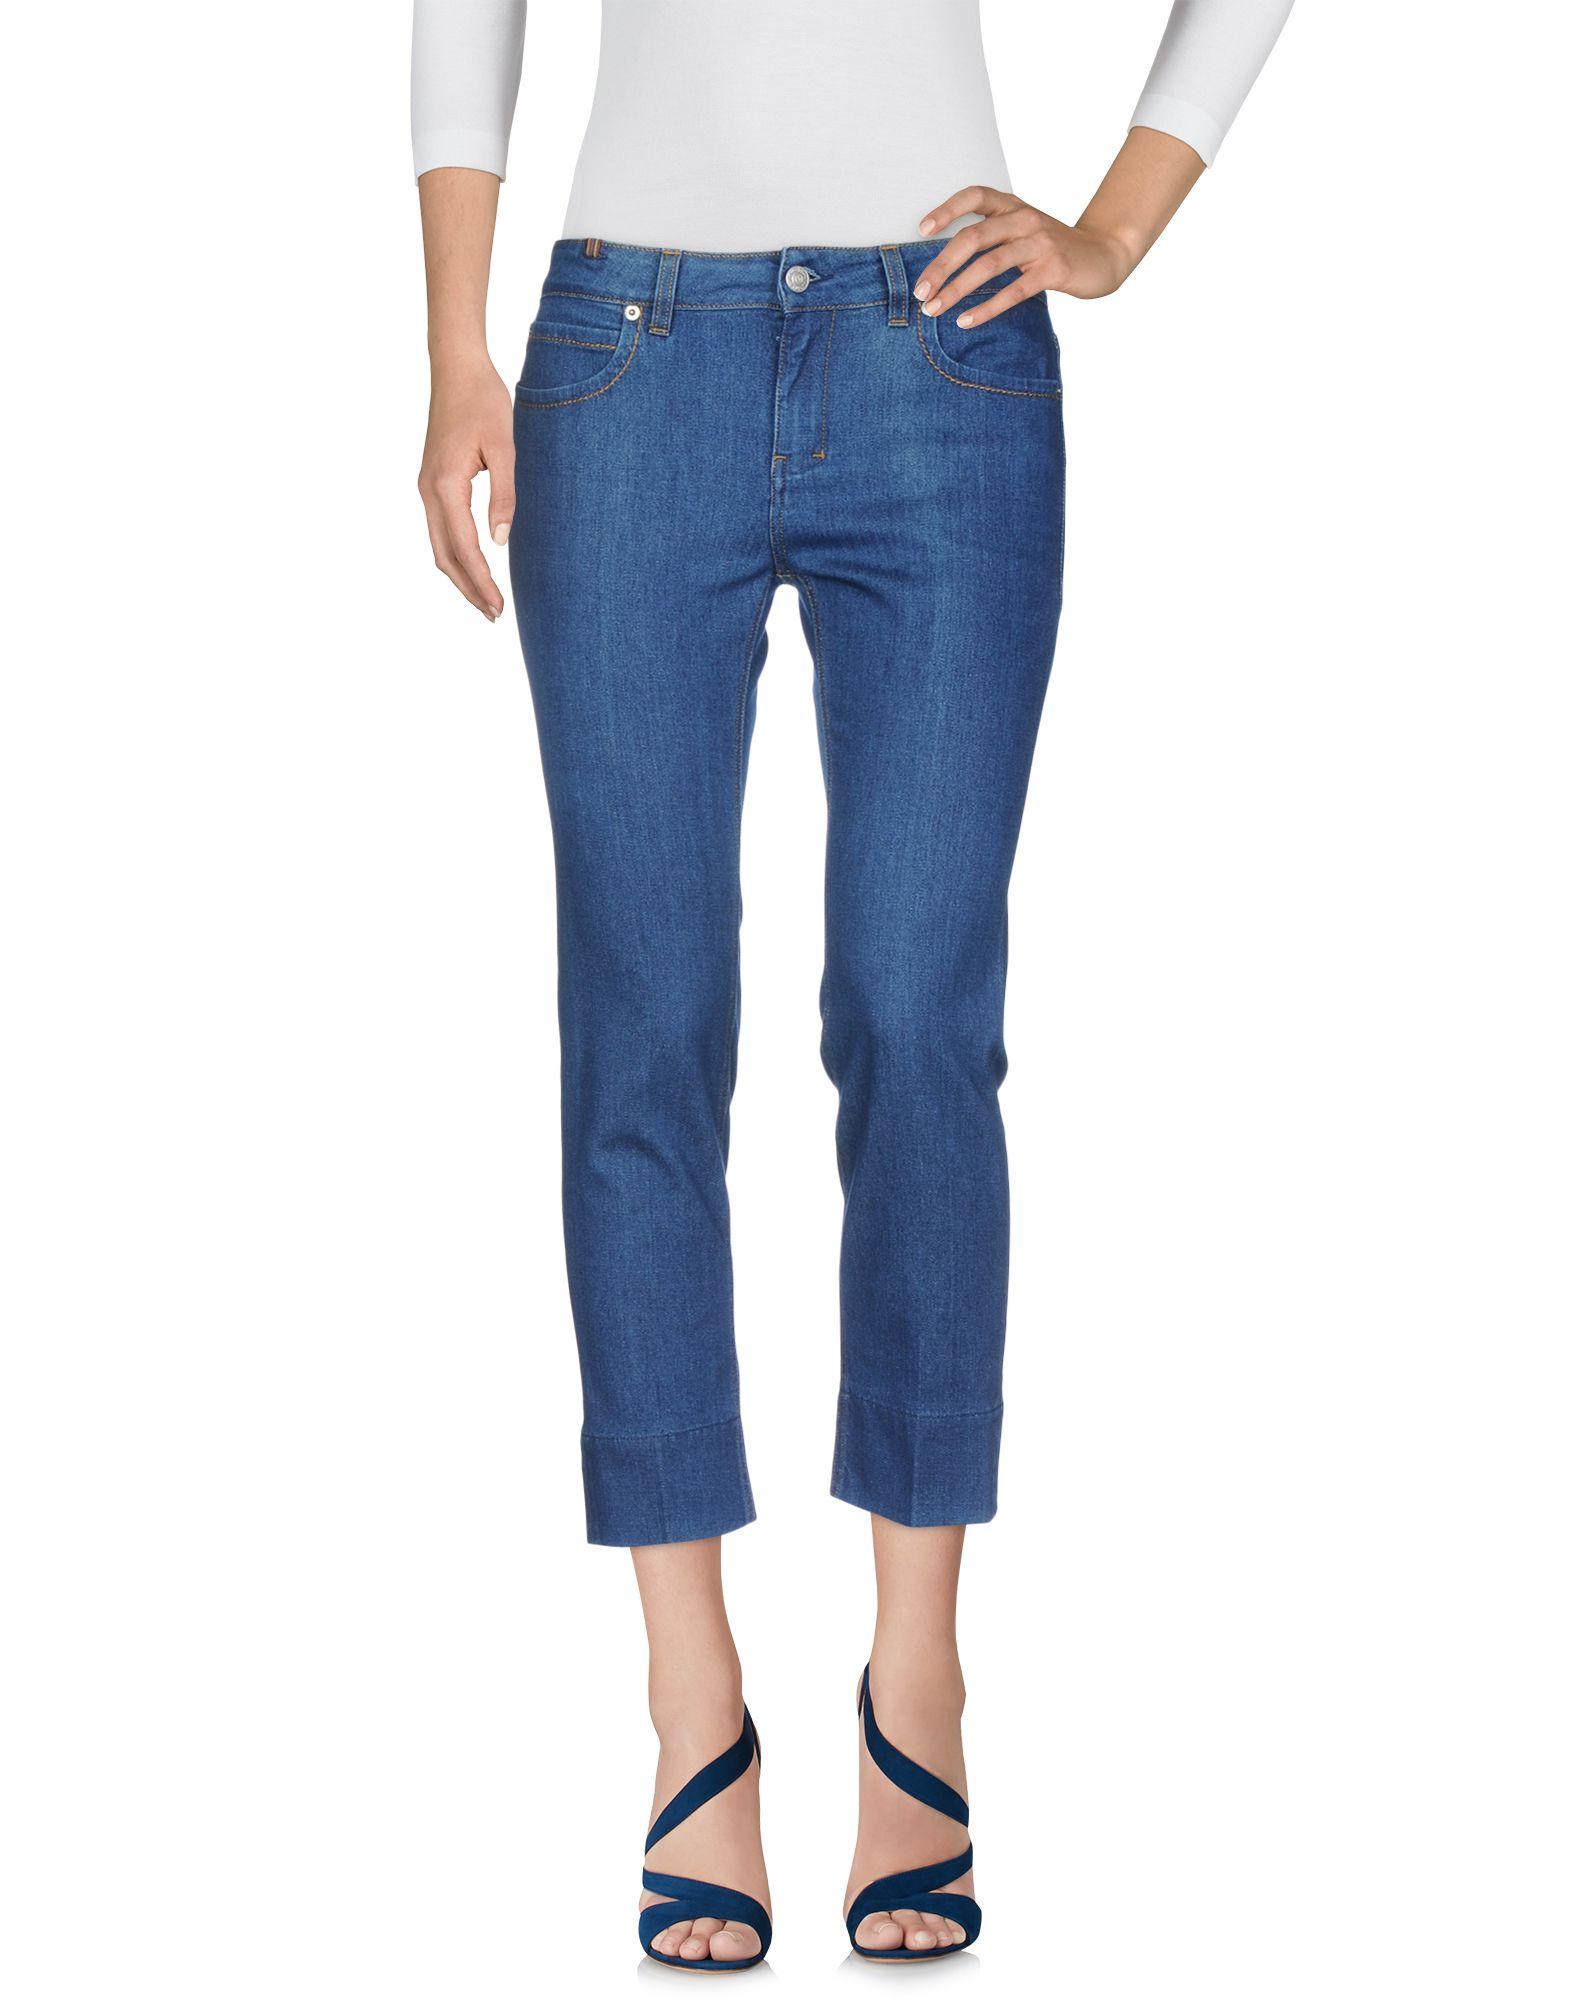 Pantaloni Jeans Notify Donna - Acquista online su 3ulci